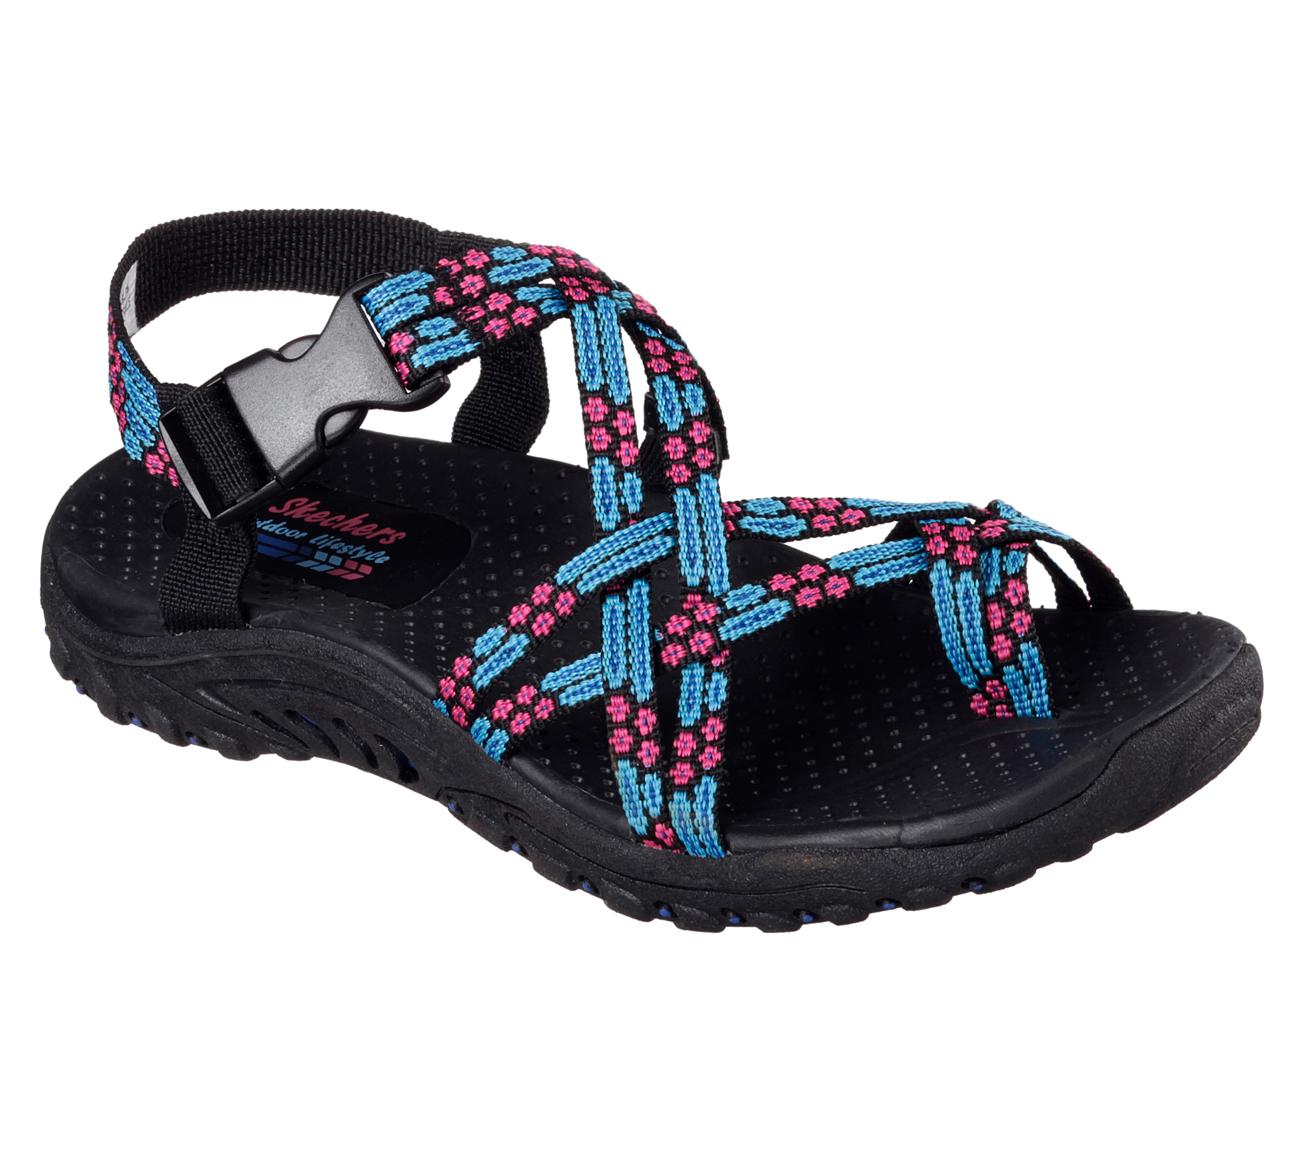 Buy Skechers Reggae Loopy Comfort Sandals Shoes Only 45 00